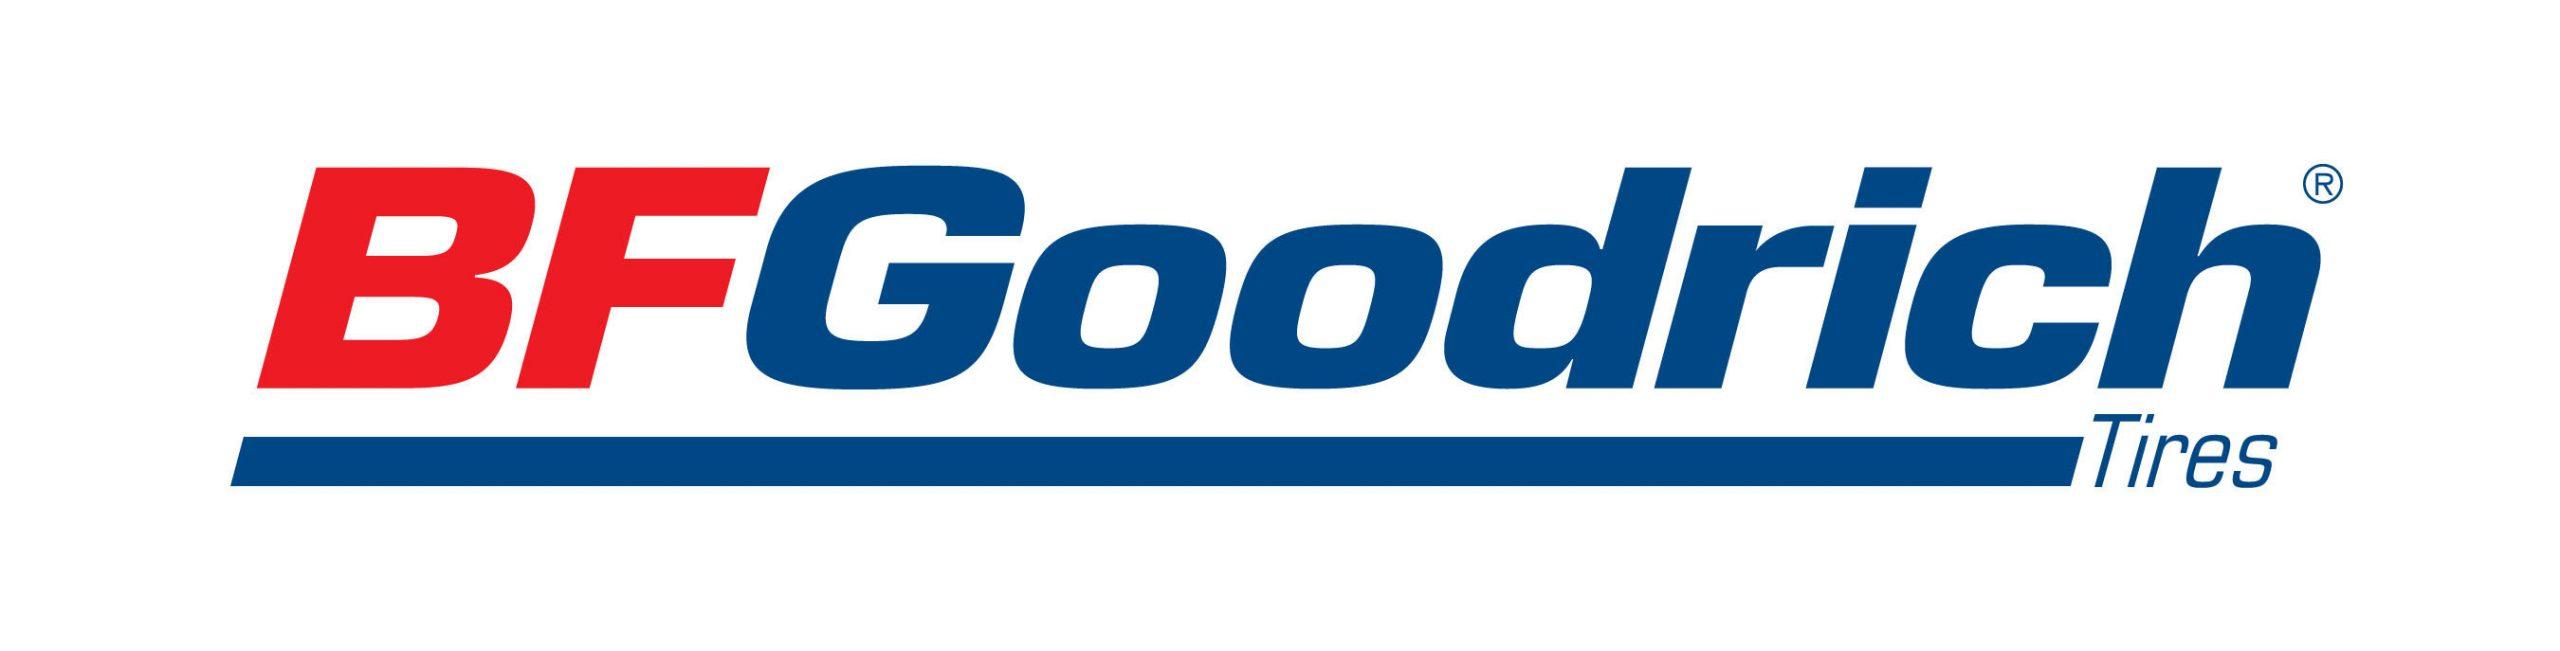 BFGoodrich Tires Logo